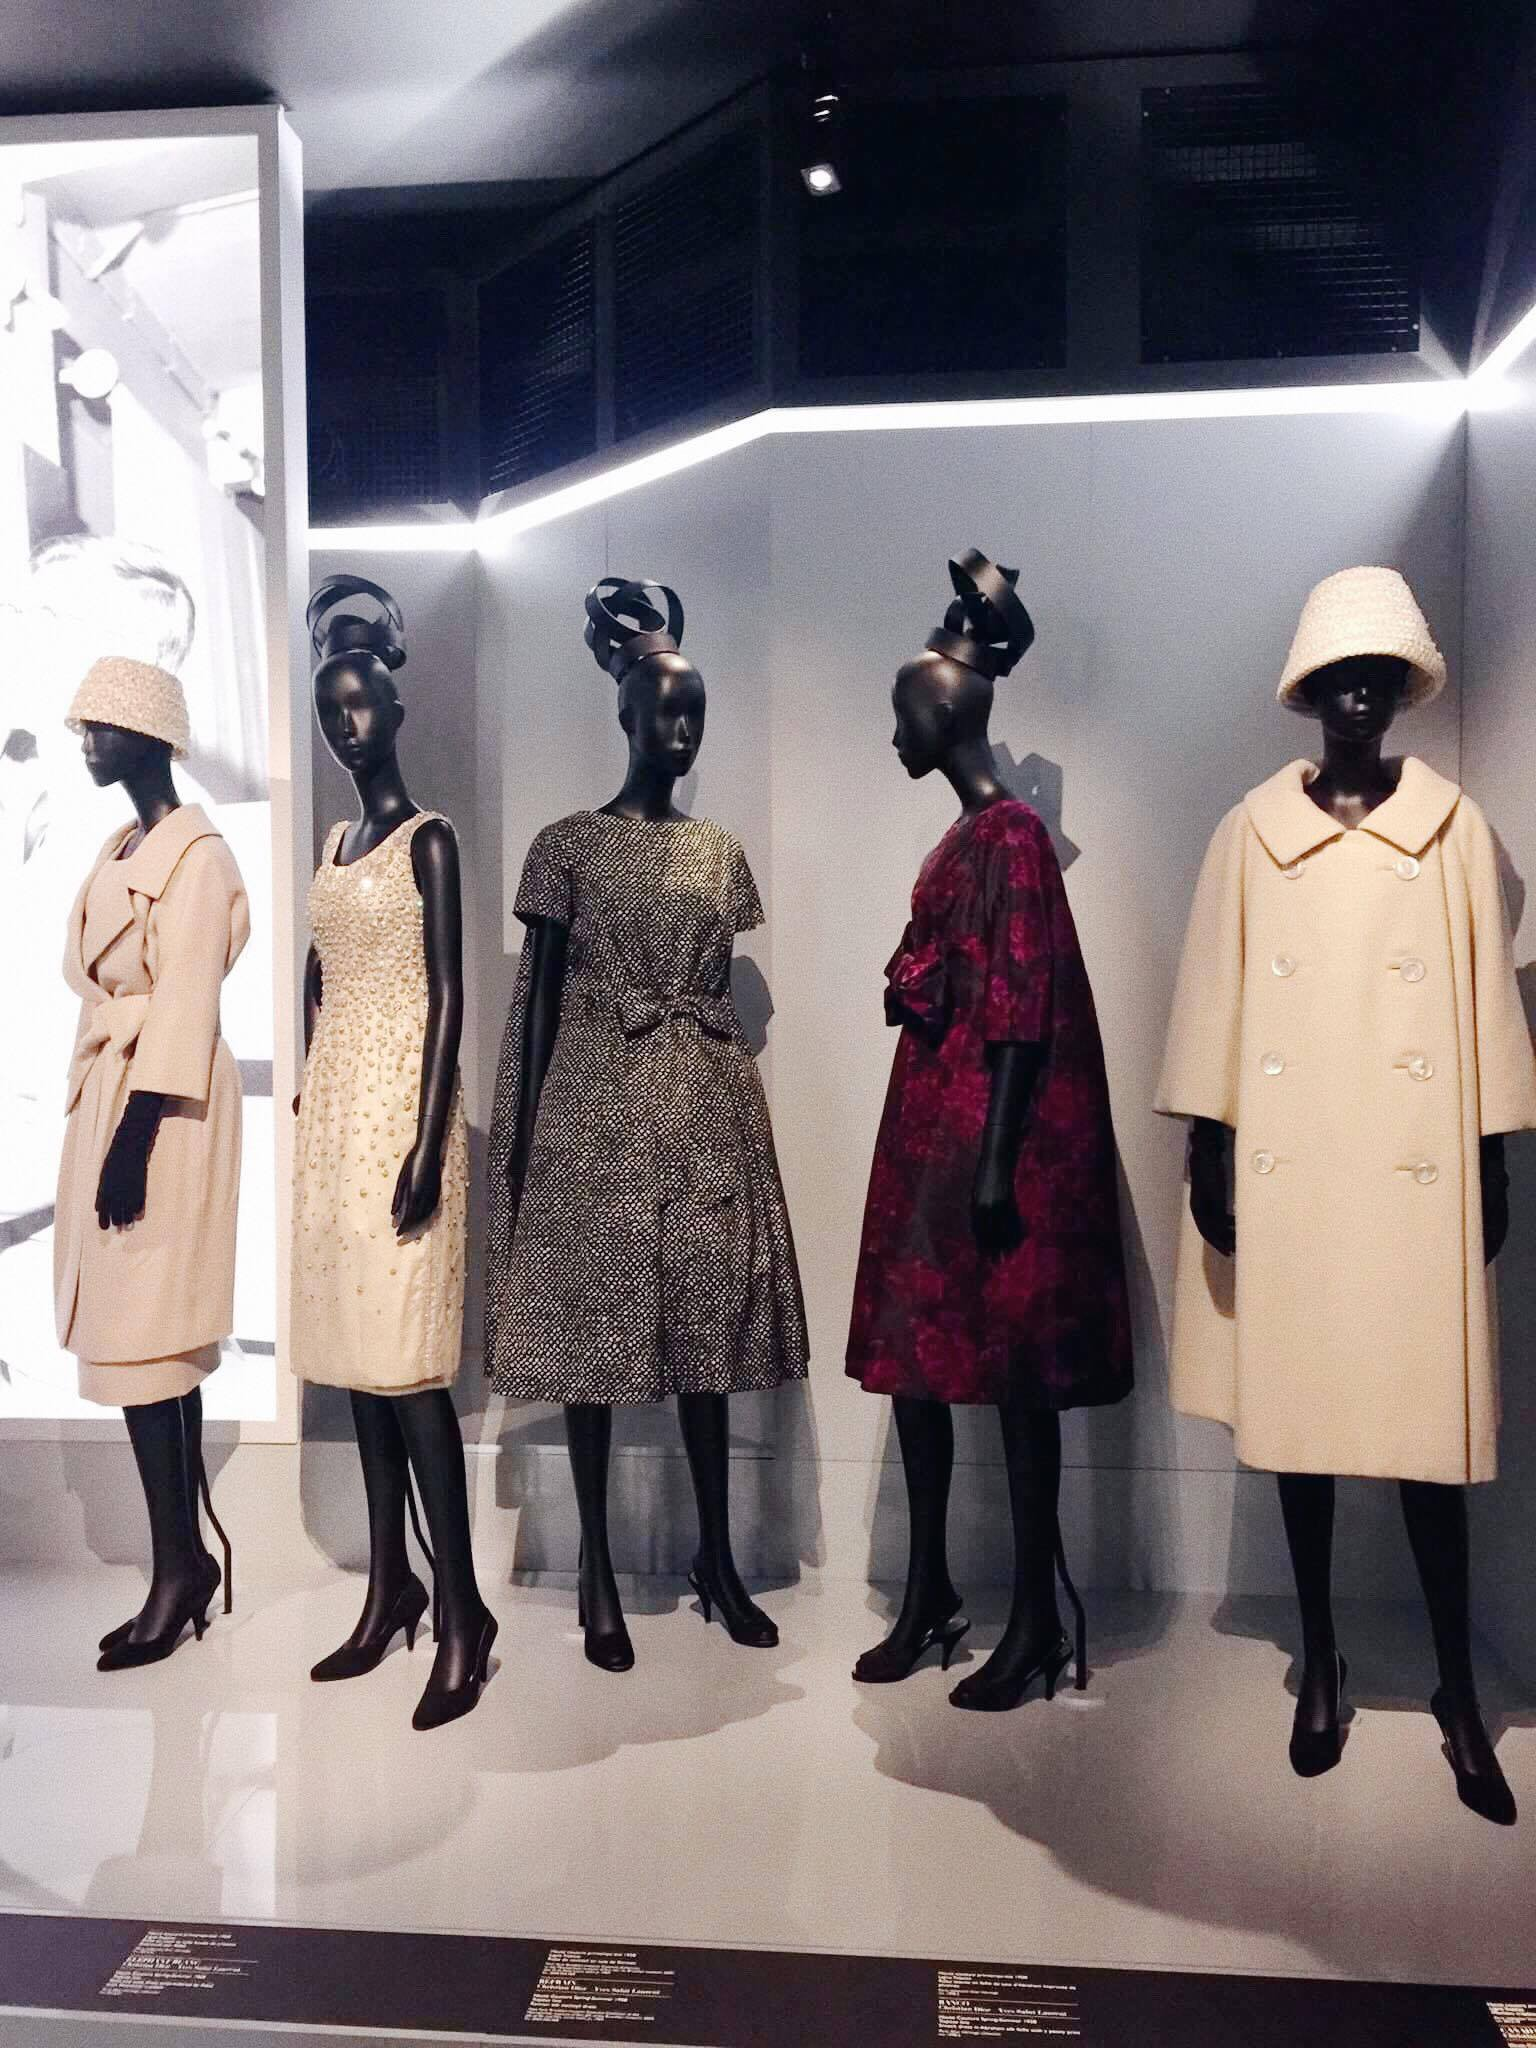 Yves Saint Laurent for Dior